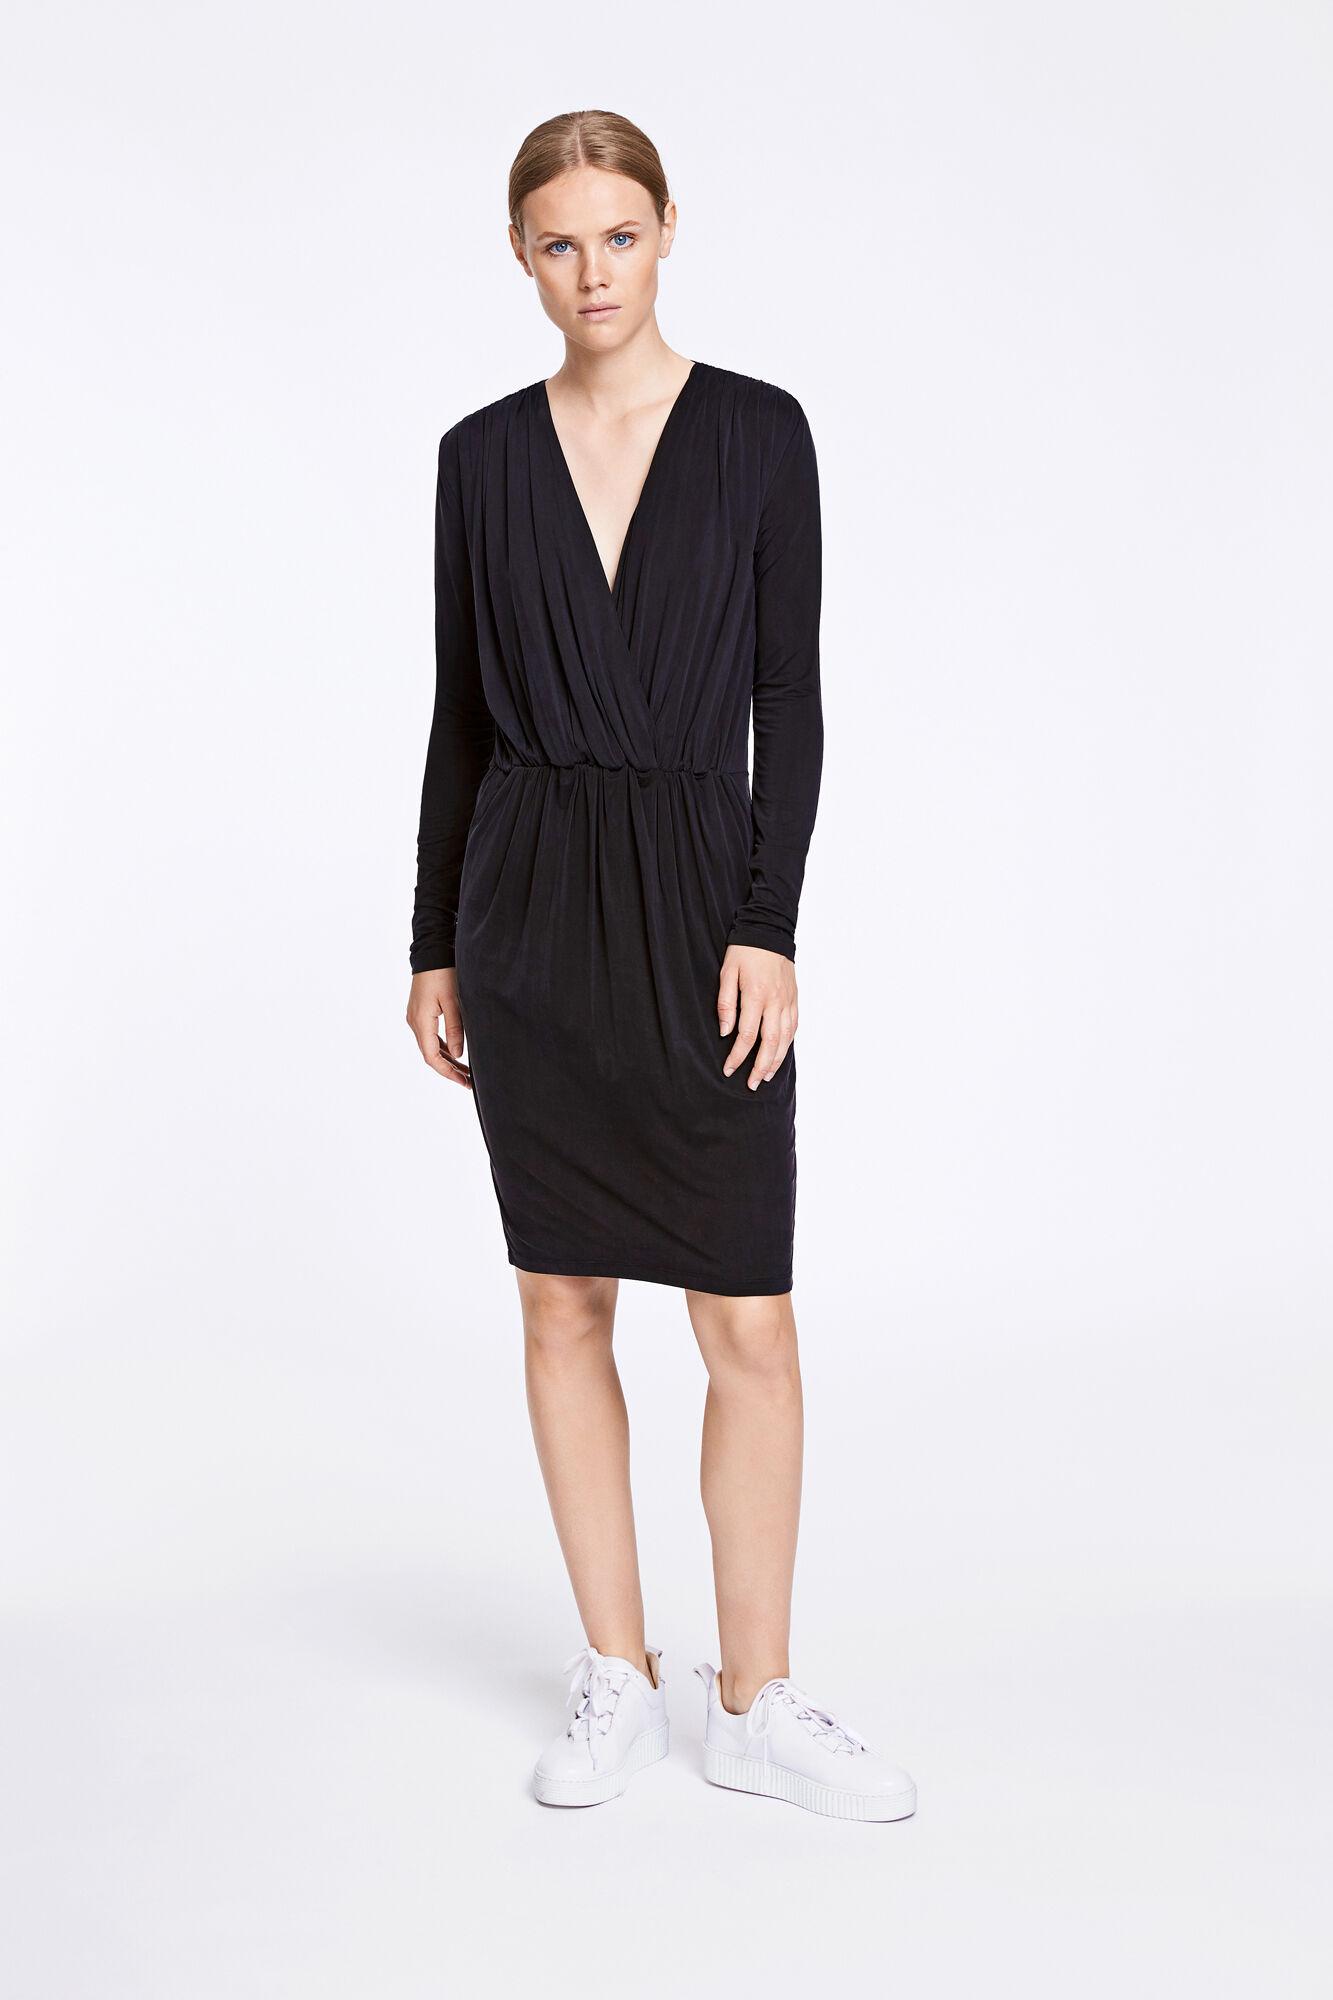 Trinny v-n dress 6202, BLACK